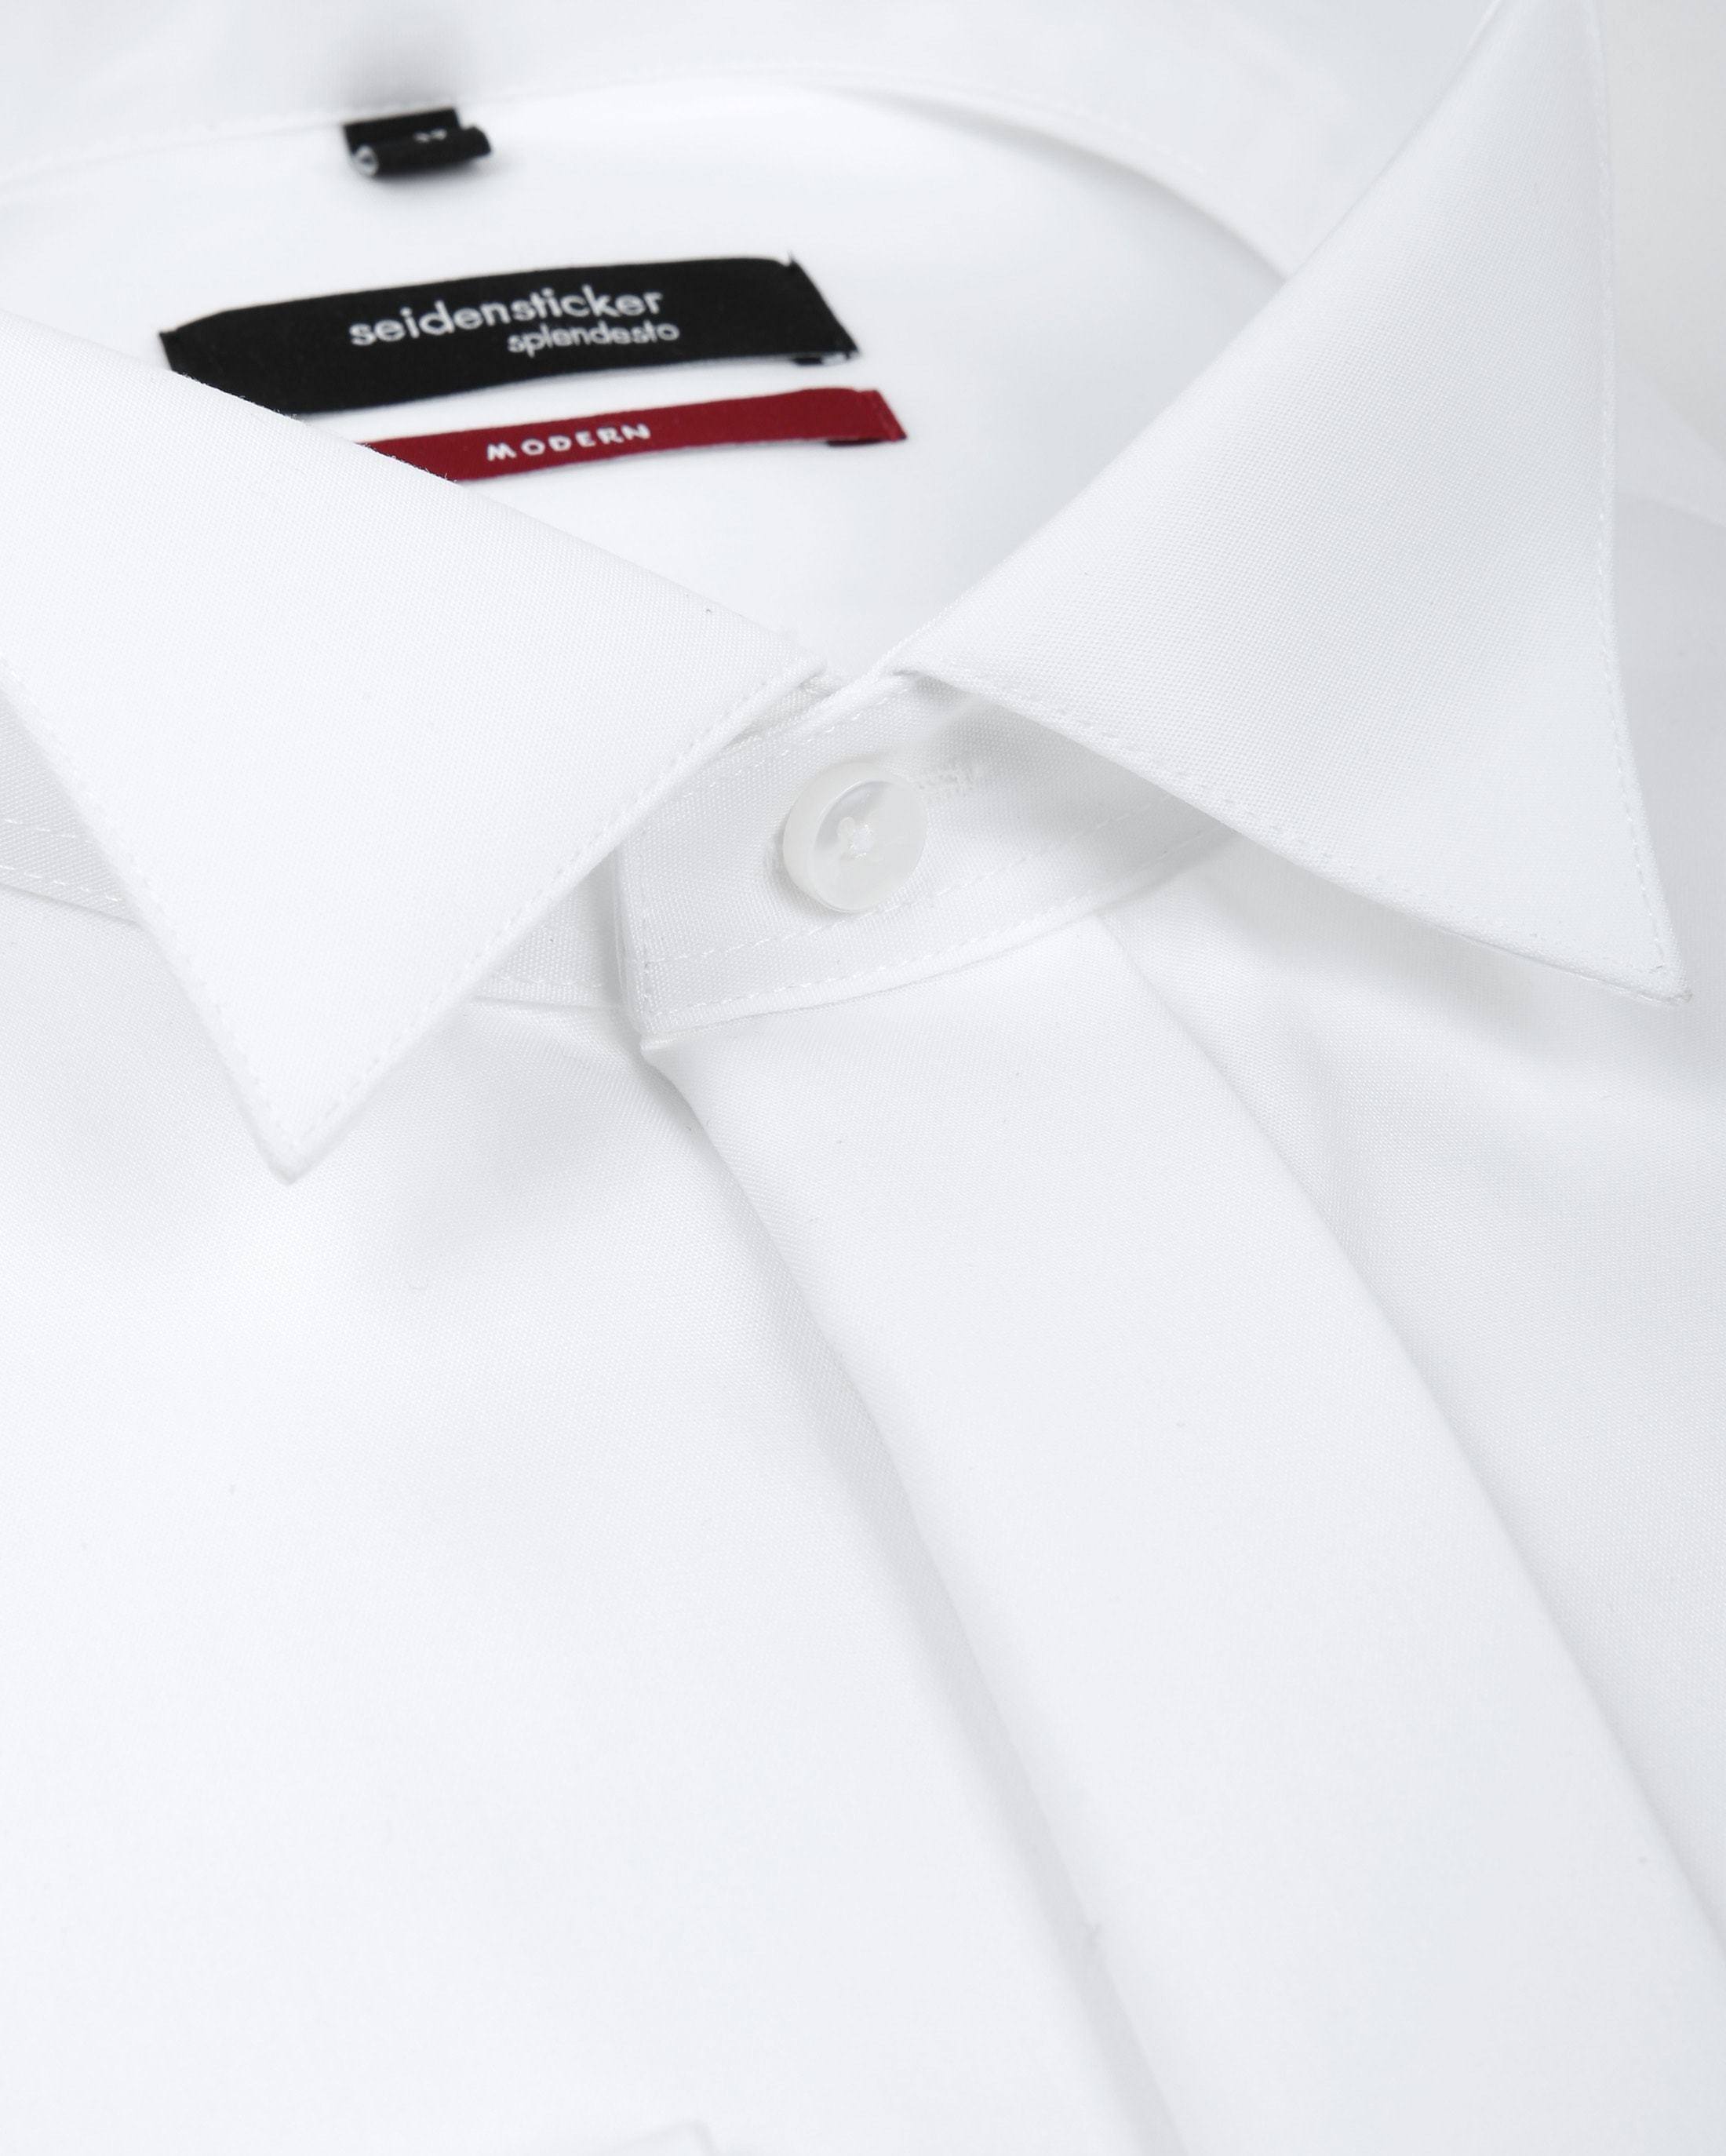 Seidensticker Tuxedo Shirt Modern-Fit foto 1